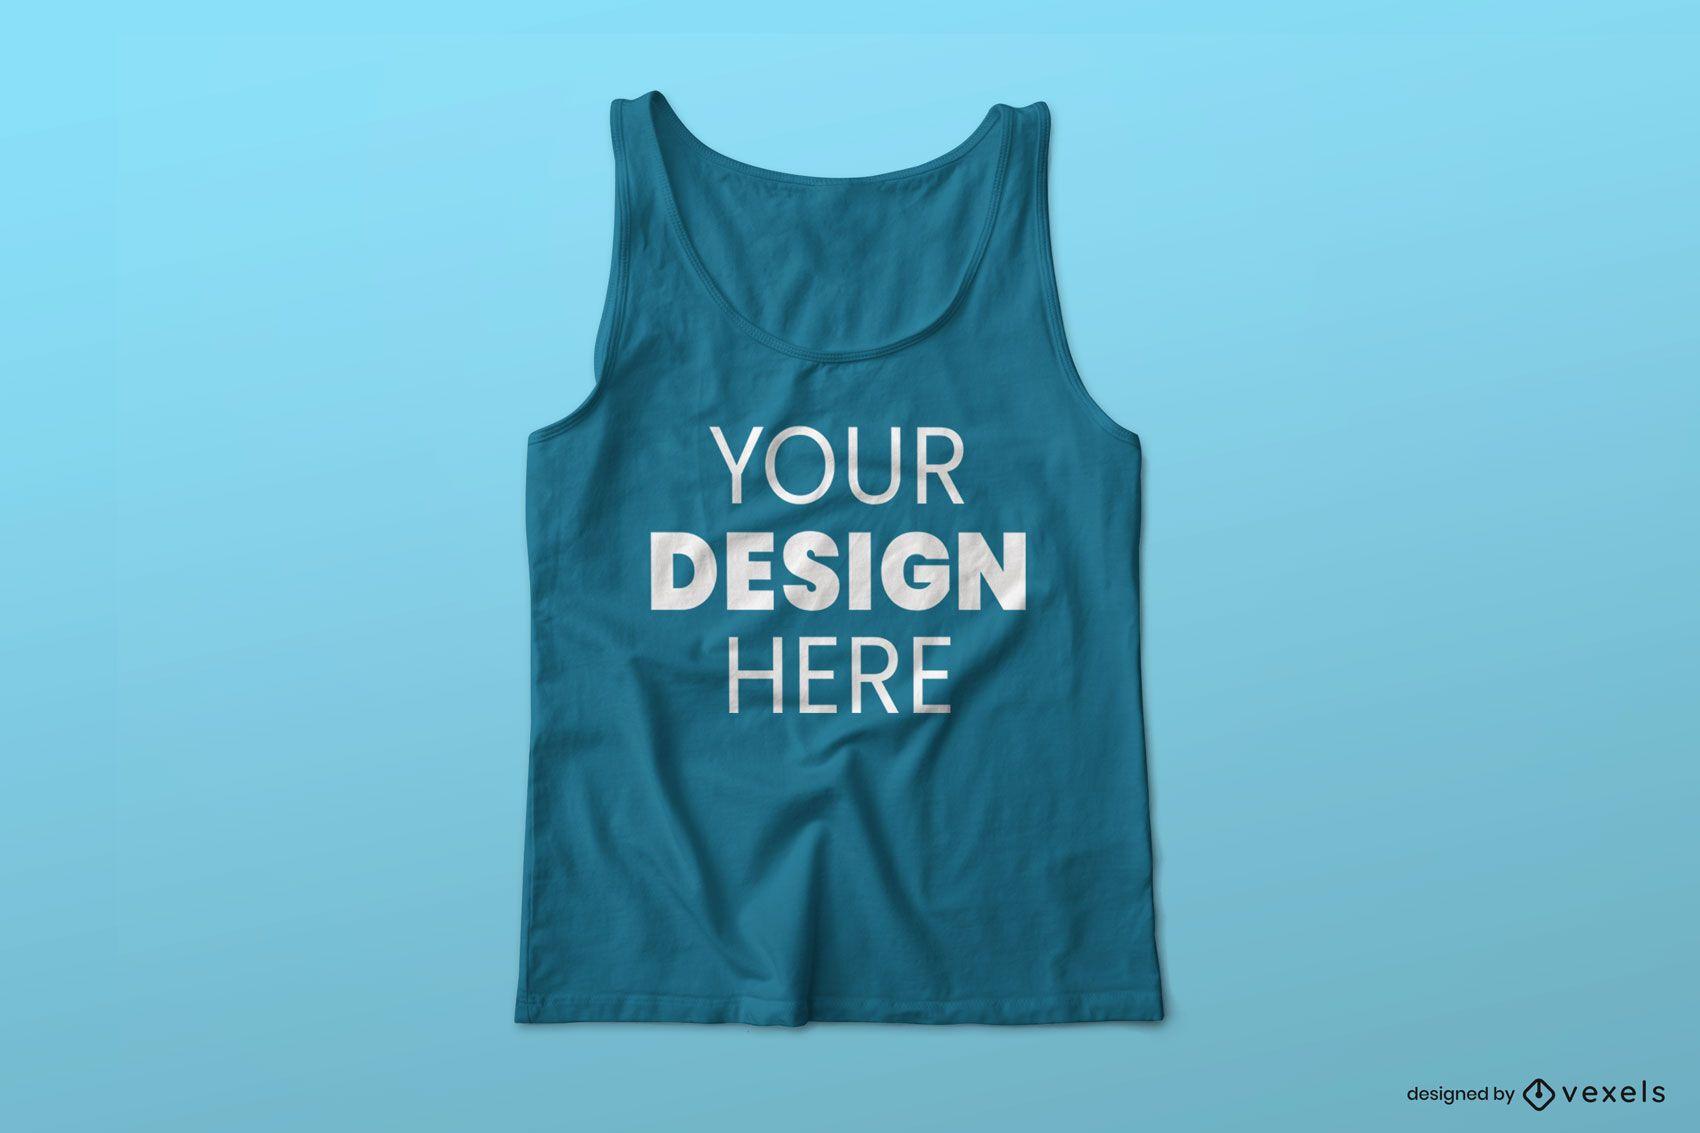 Diseño de maqueta psd de camiseta sin mangas